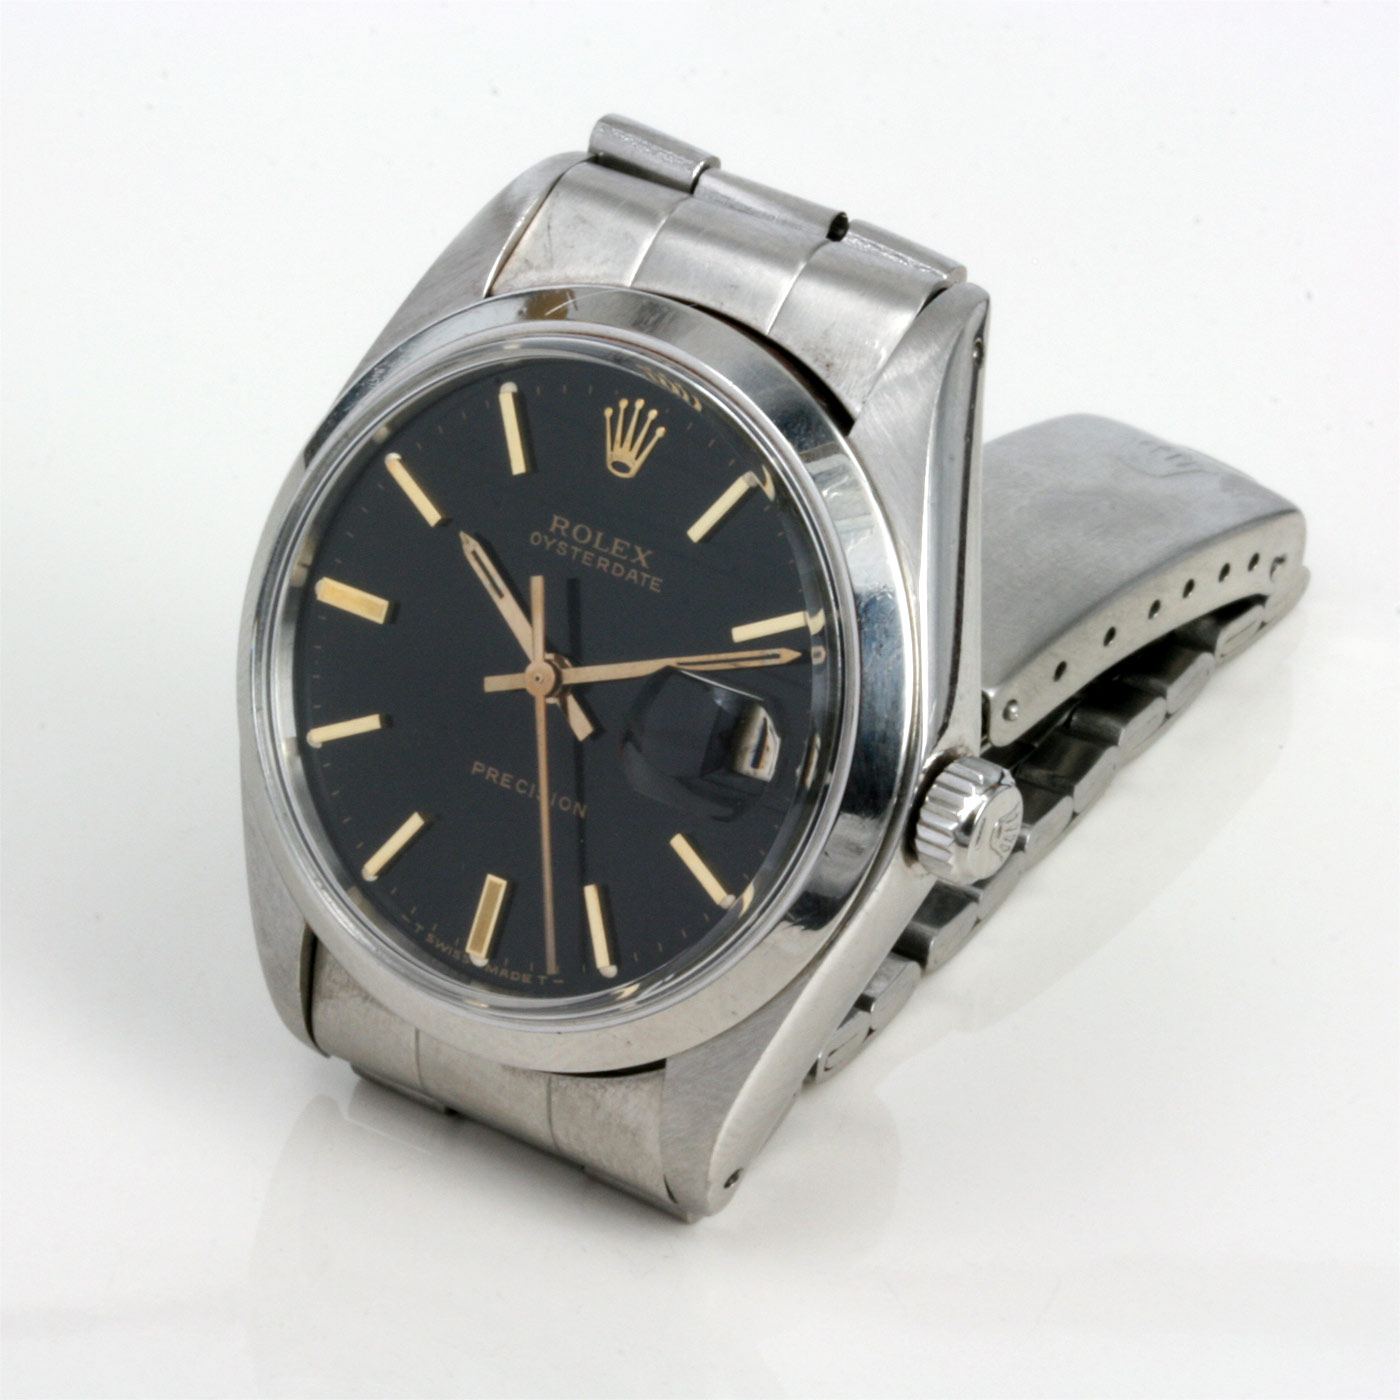 buy 1968 vintage rolex precision watch model 6684 sold